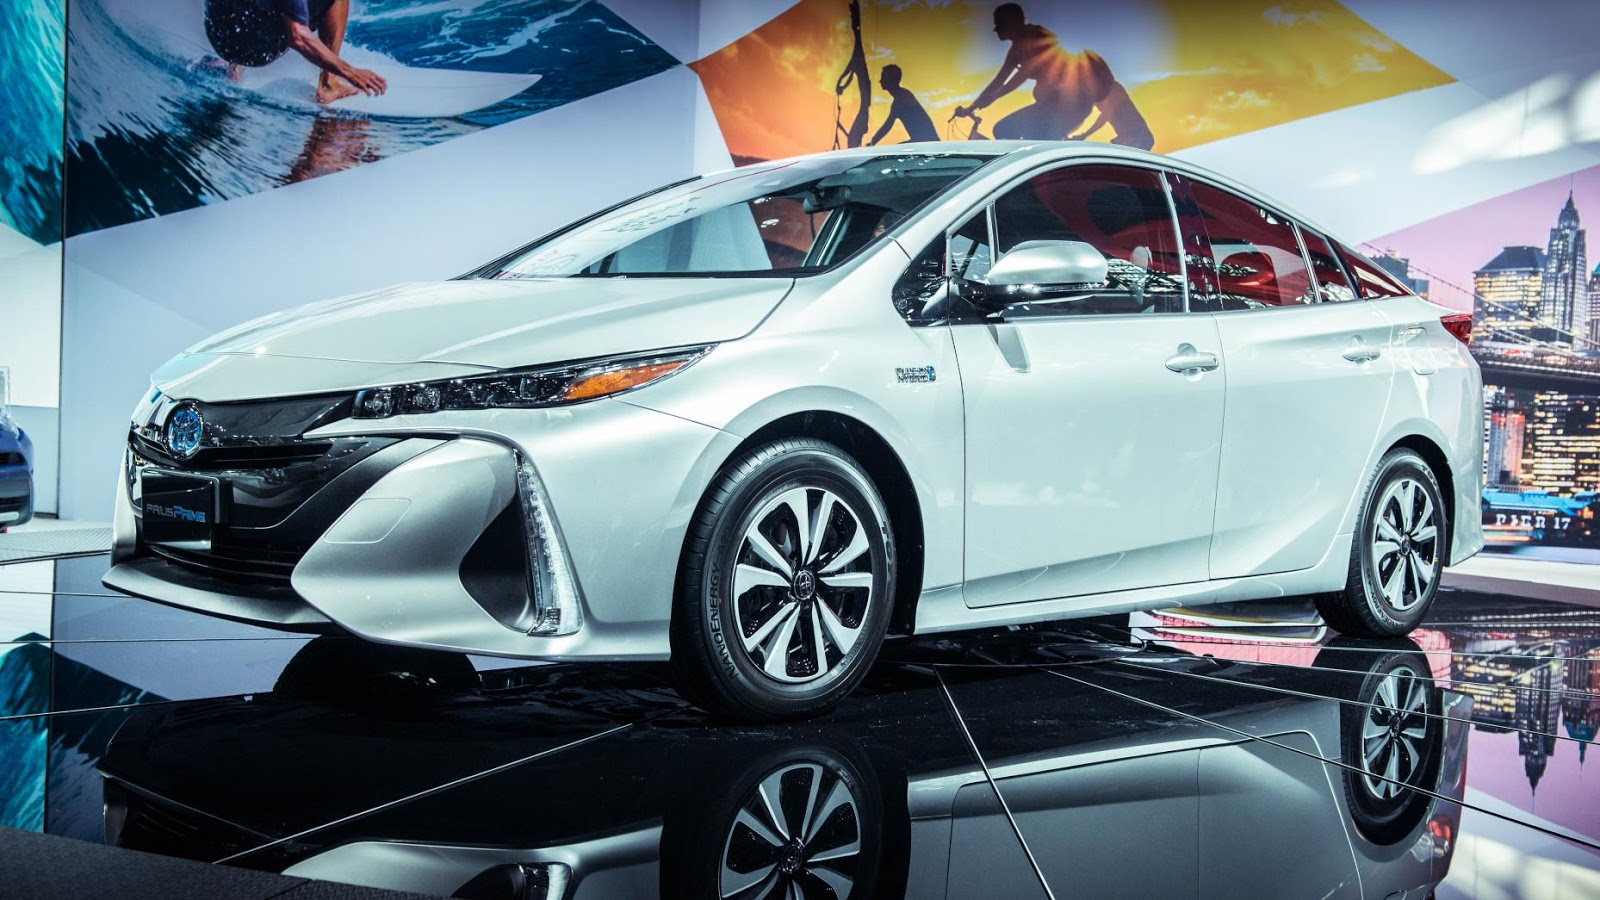 Toyots Prius Plug-in